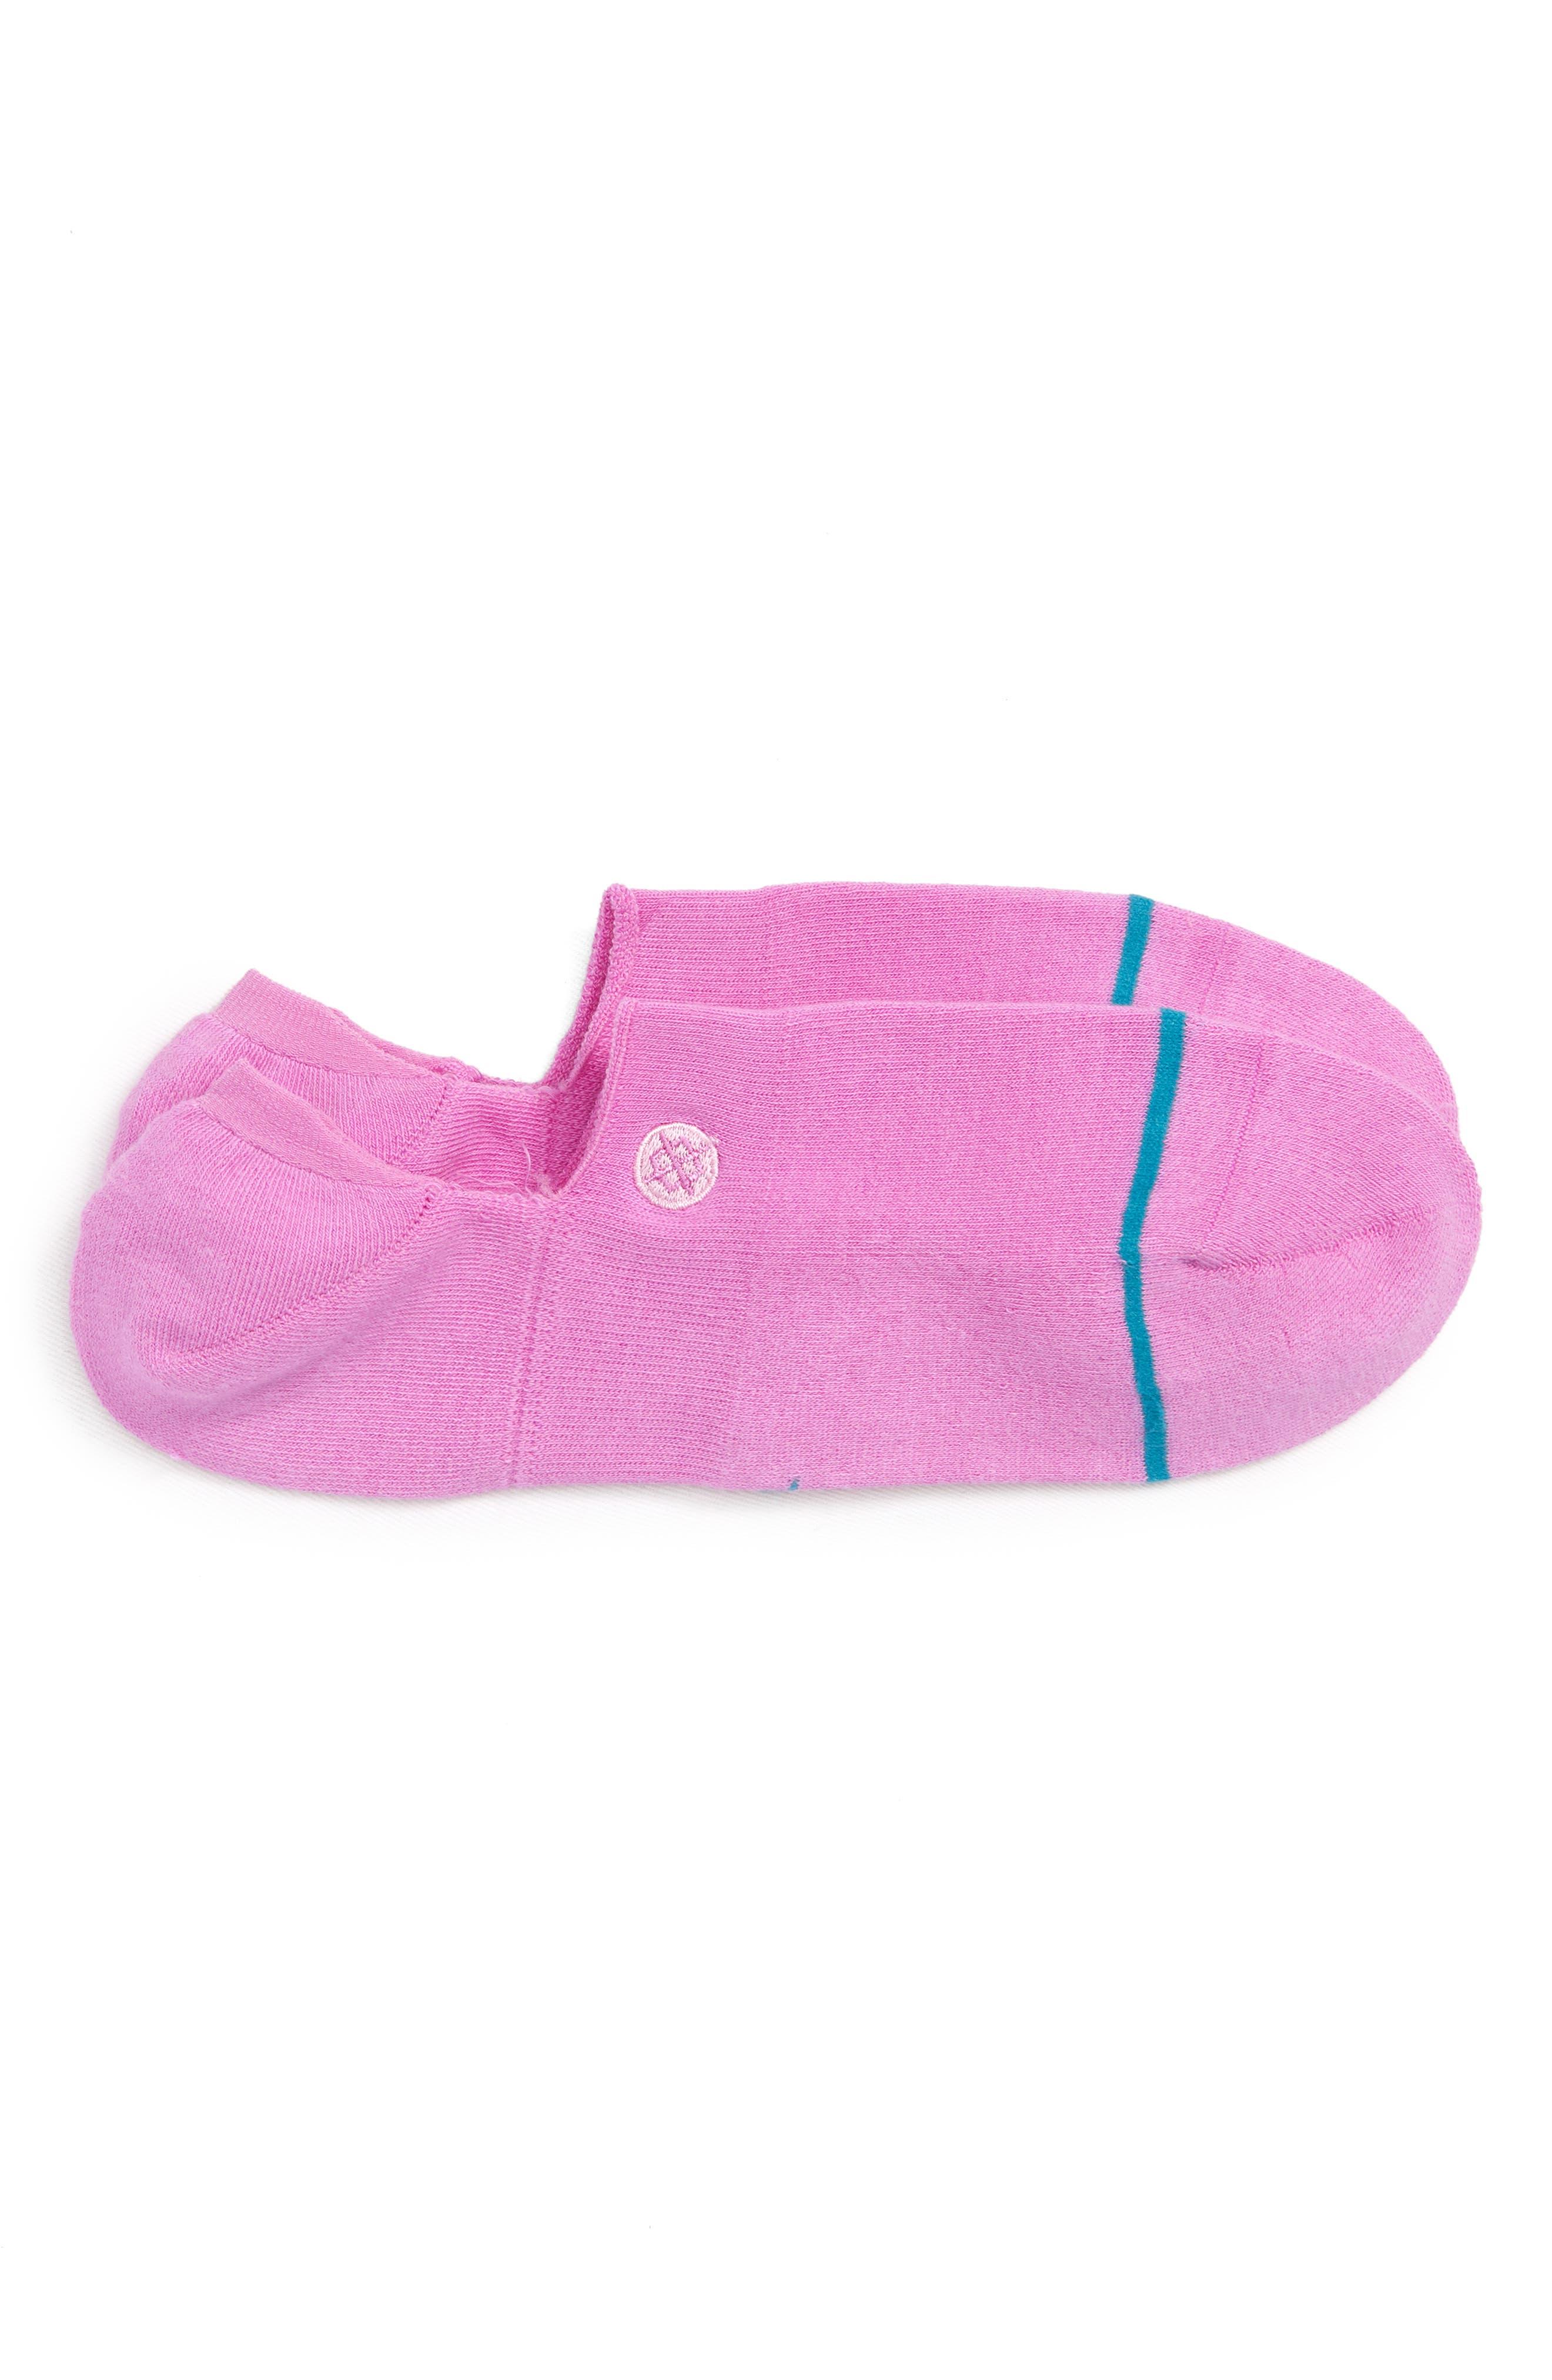 Gamut Liner Socks,                             Main thumbnail 1, color,                             Saturated Pink